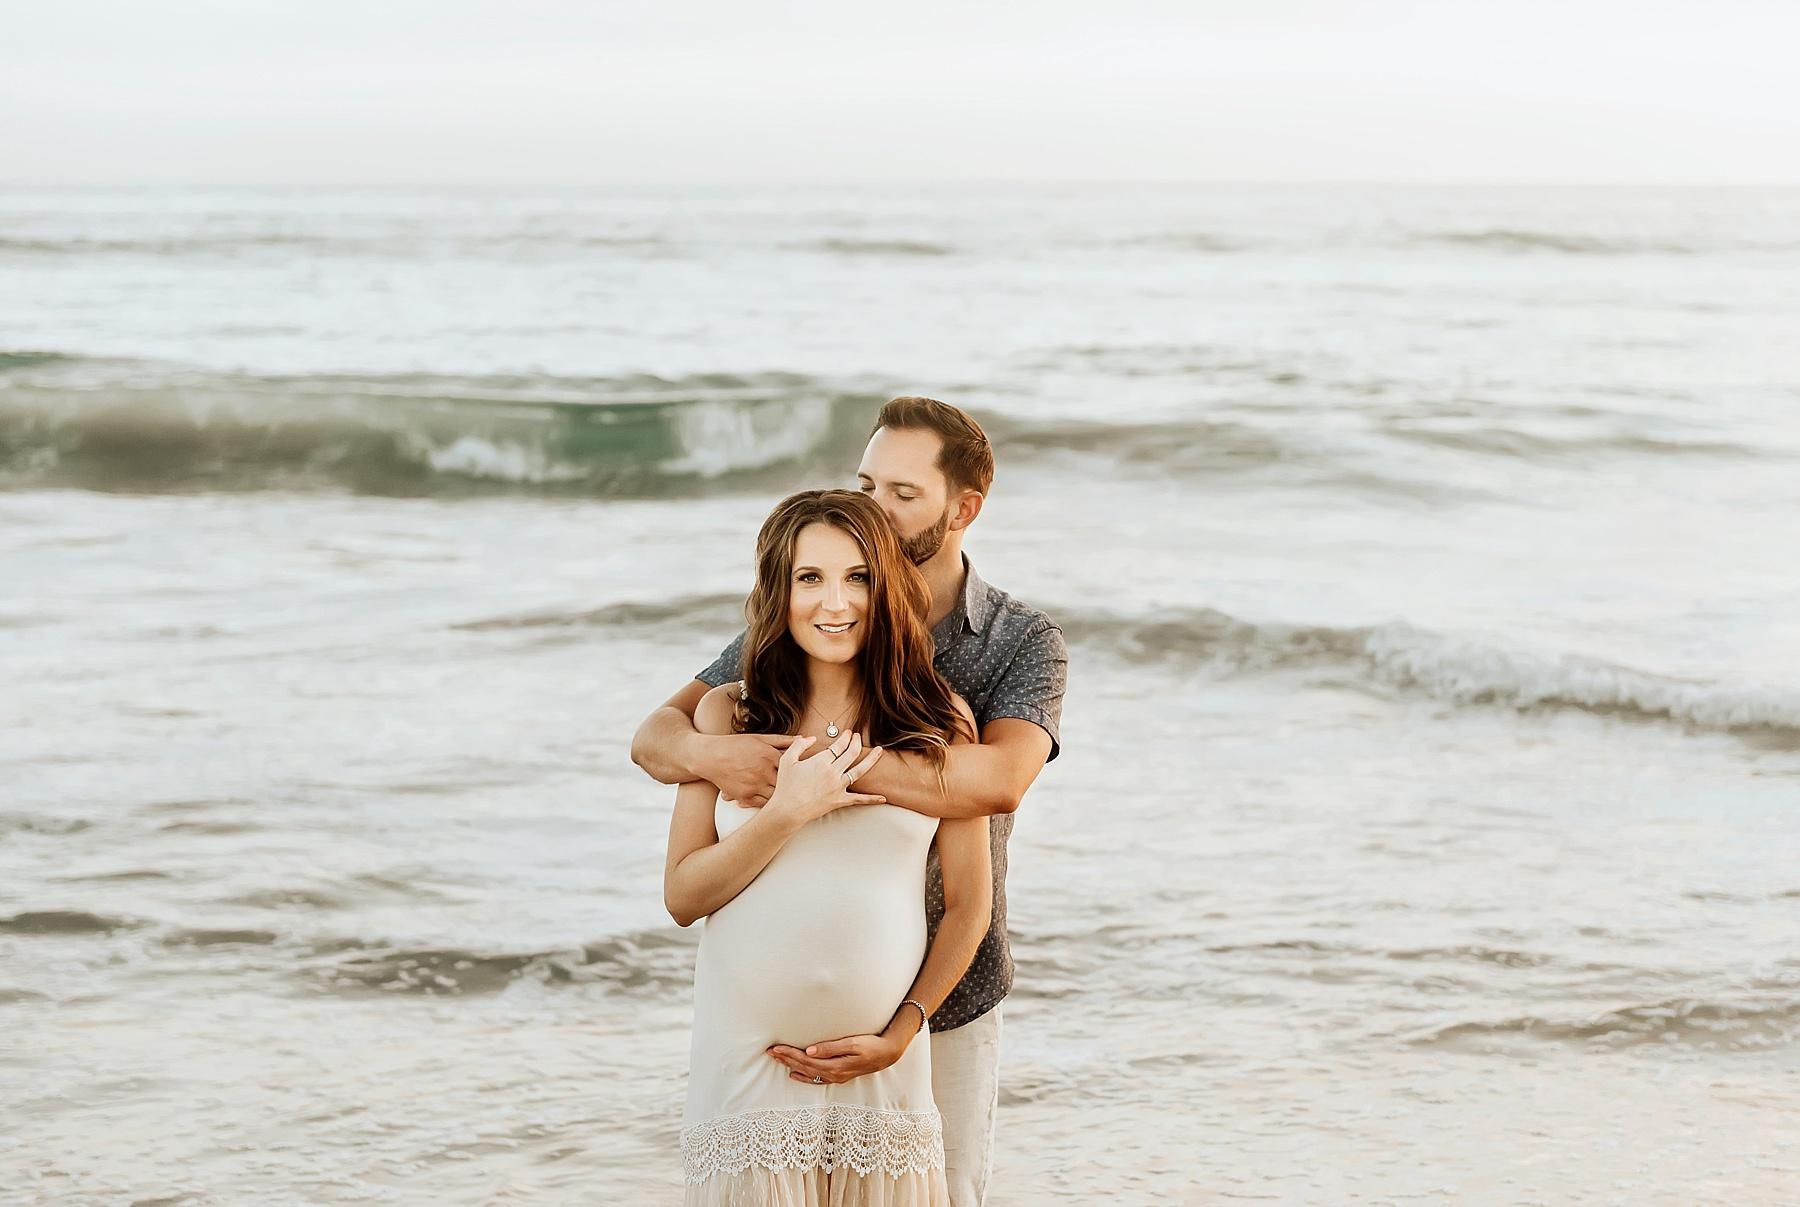 pregnancy beach photography couple pose